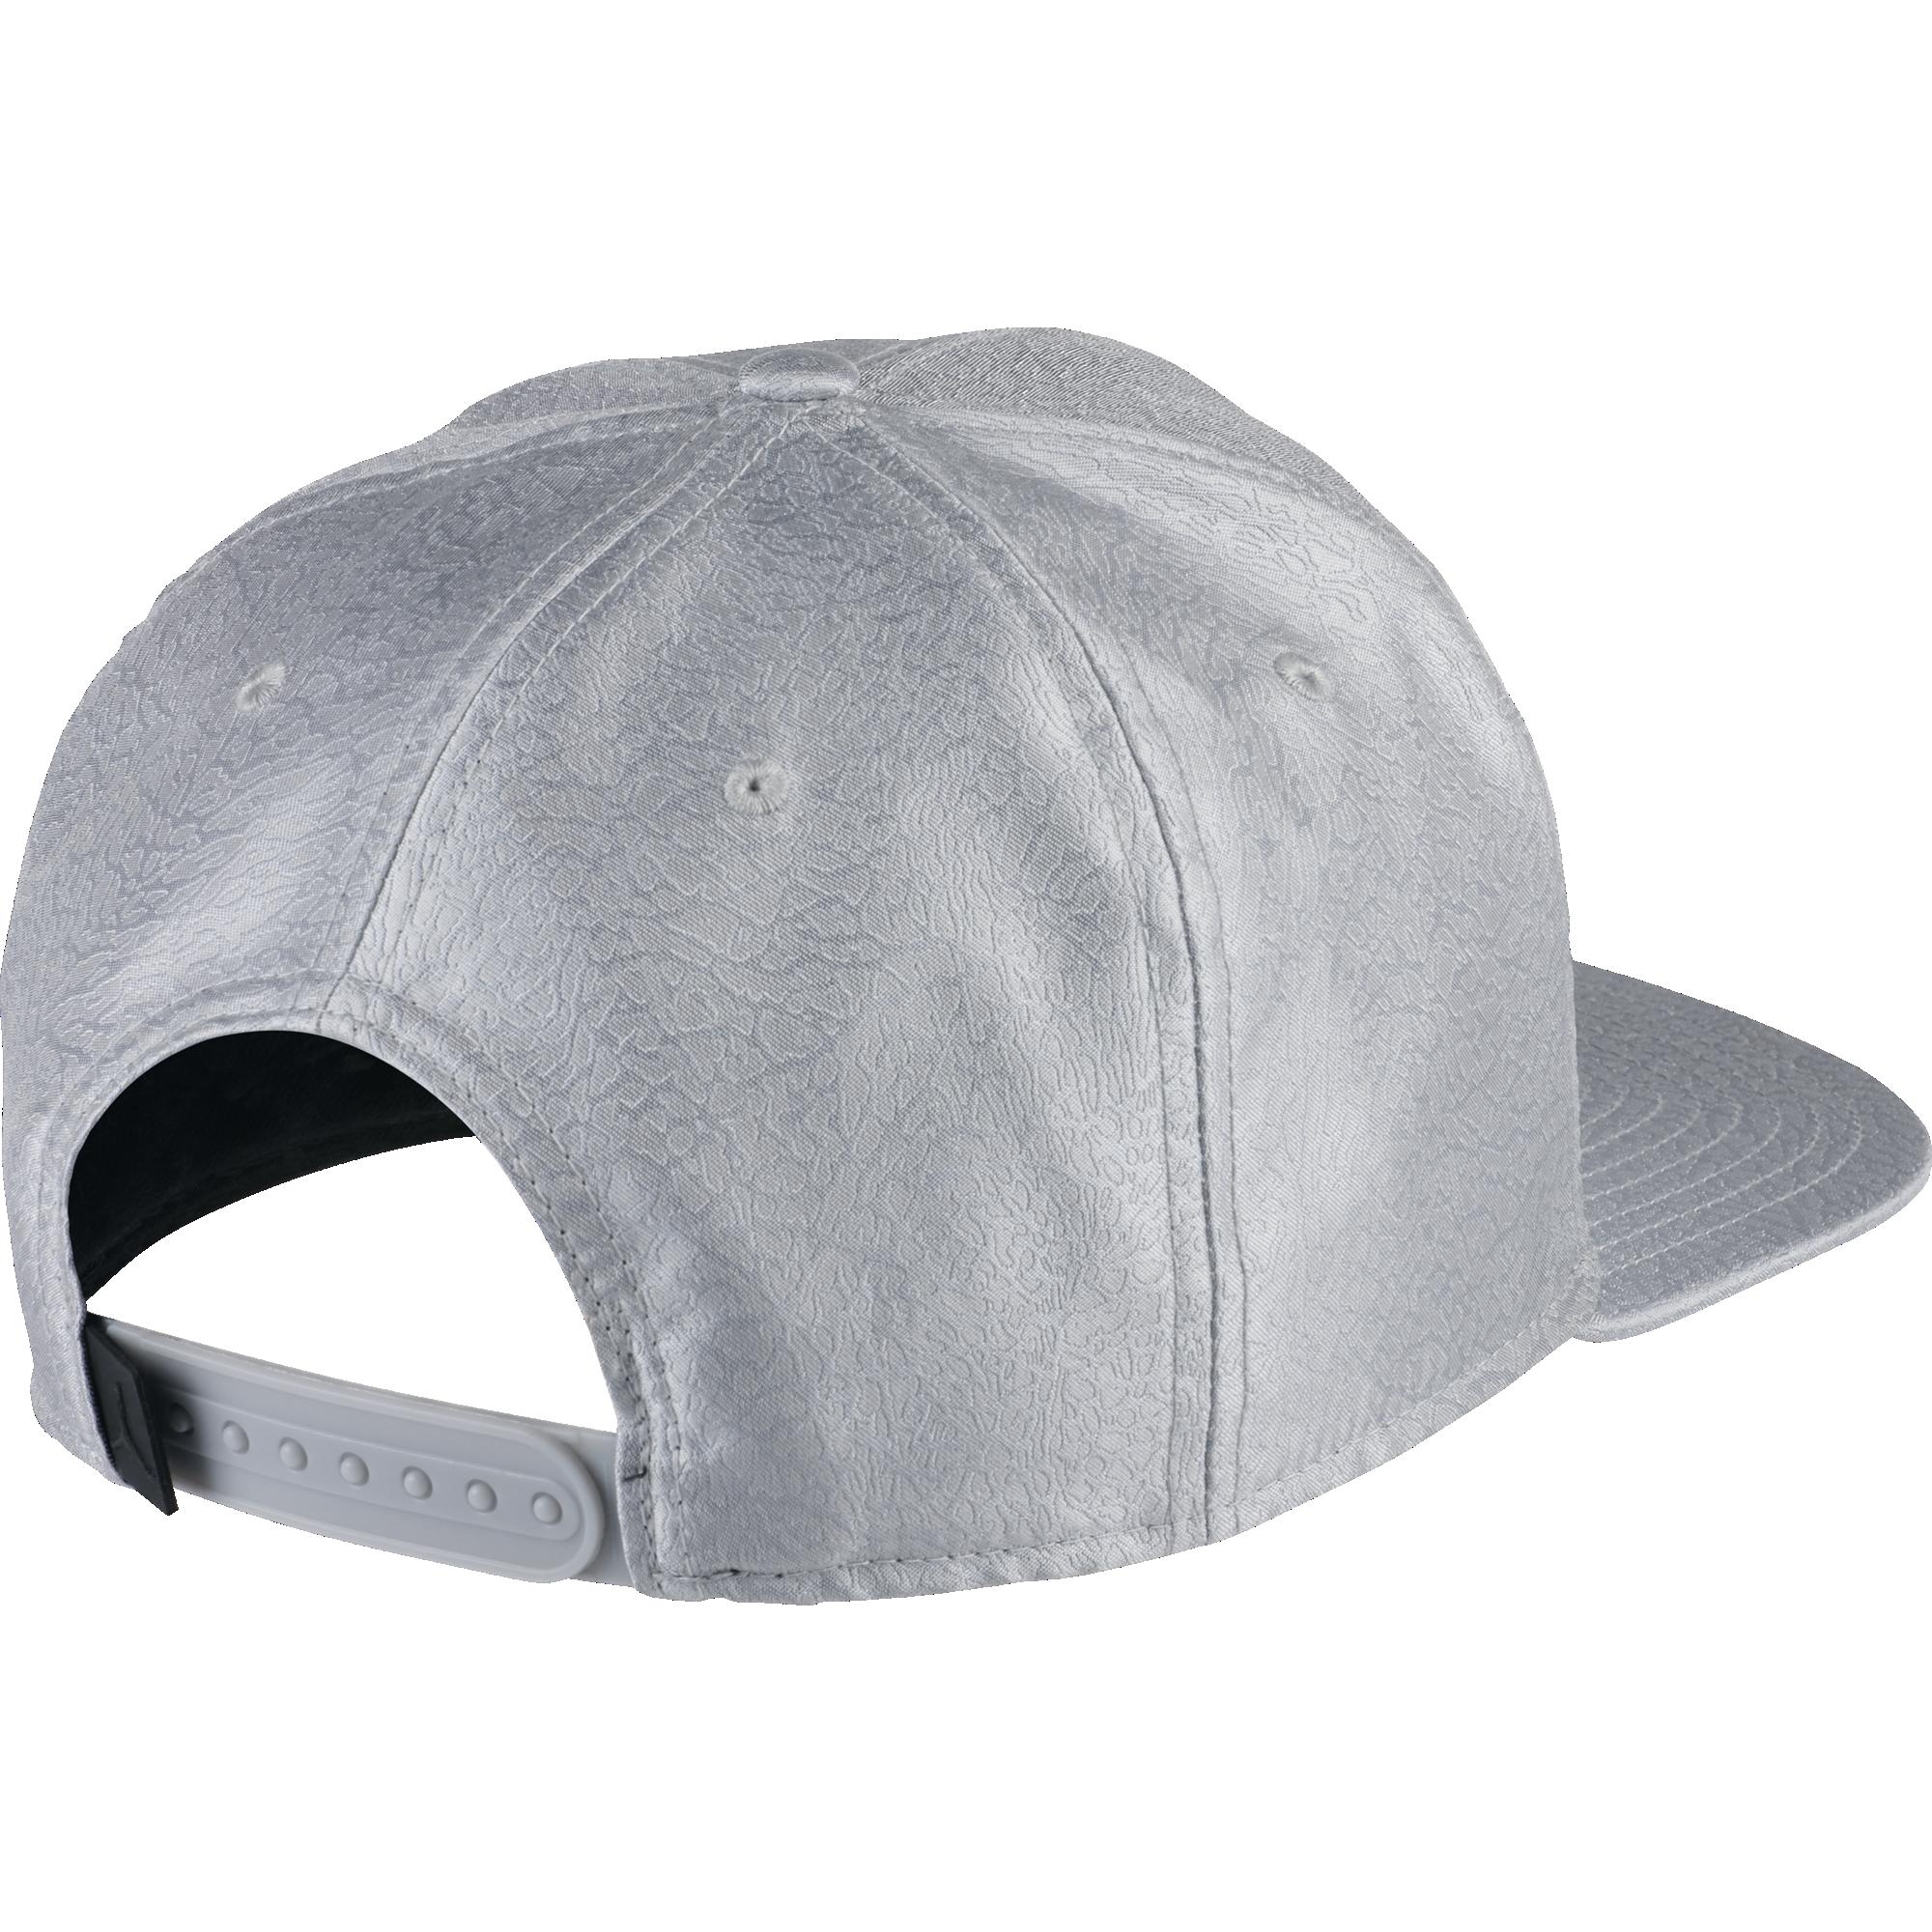 AIR JORDAN JUMPMAN ELEPHANT PRINT INGOT PRO HAT for 2650.00 ... d8f6344794d